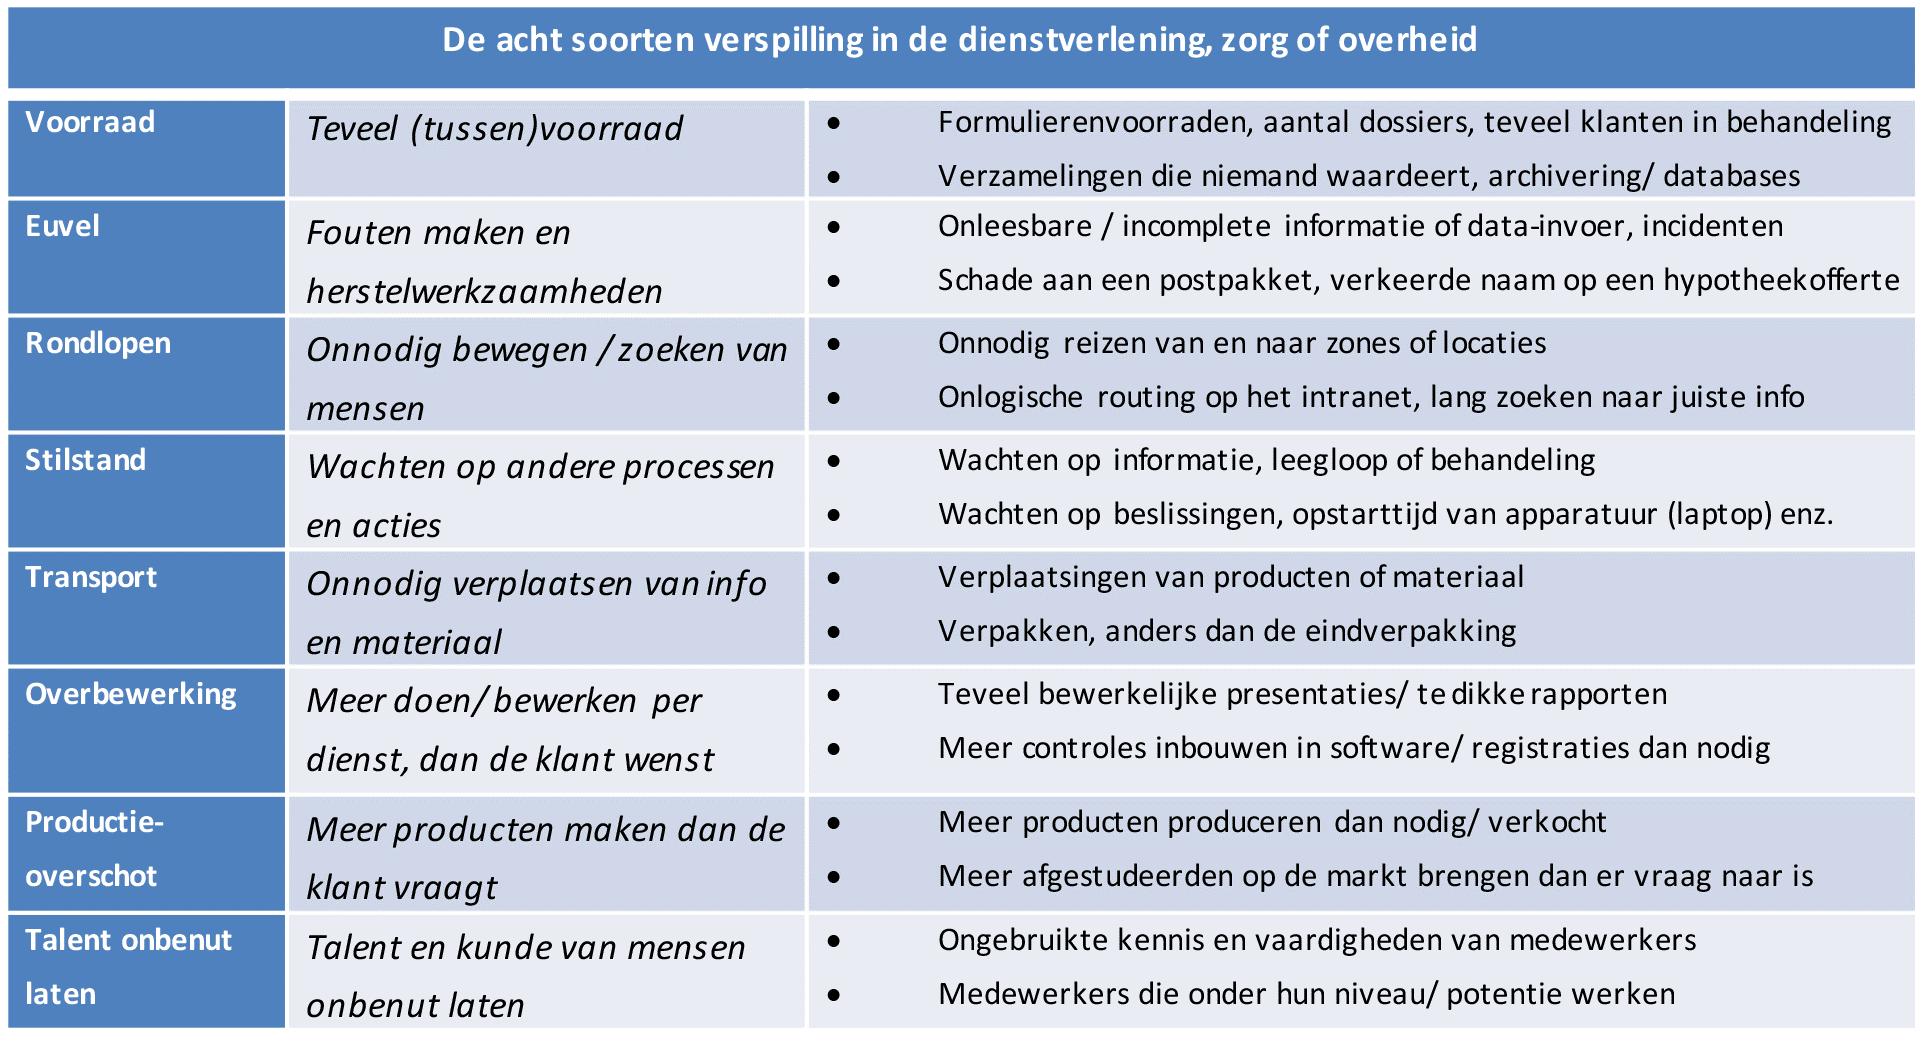 VERSTOPT tabel.png